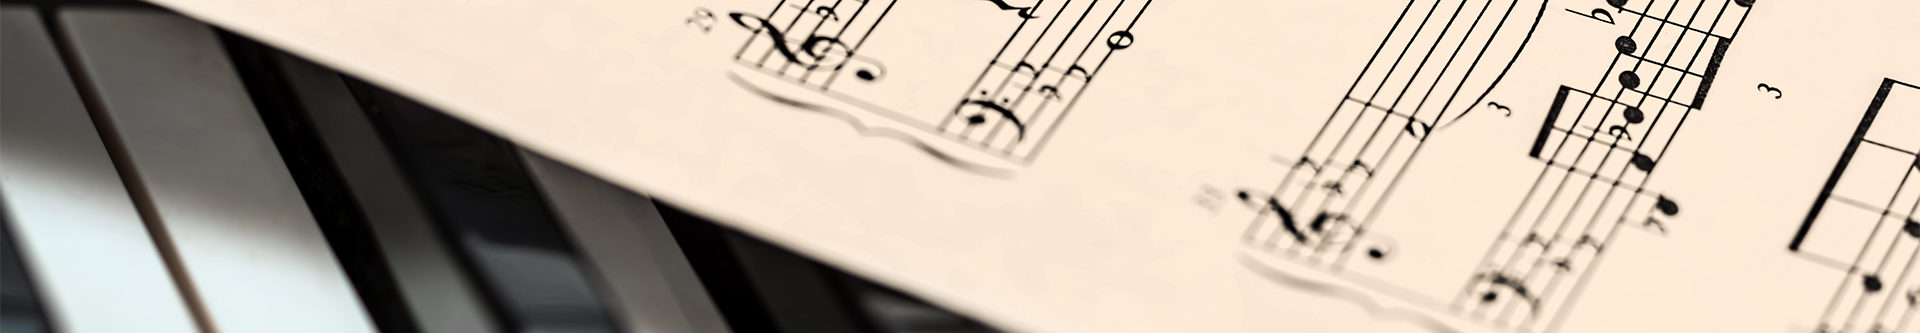 download free music books